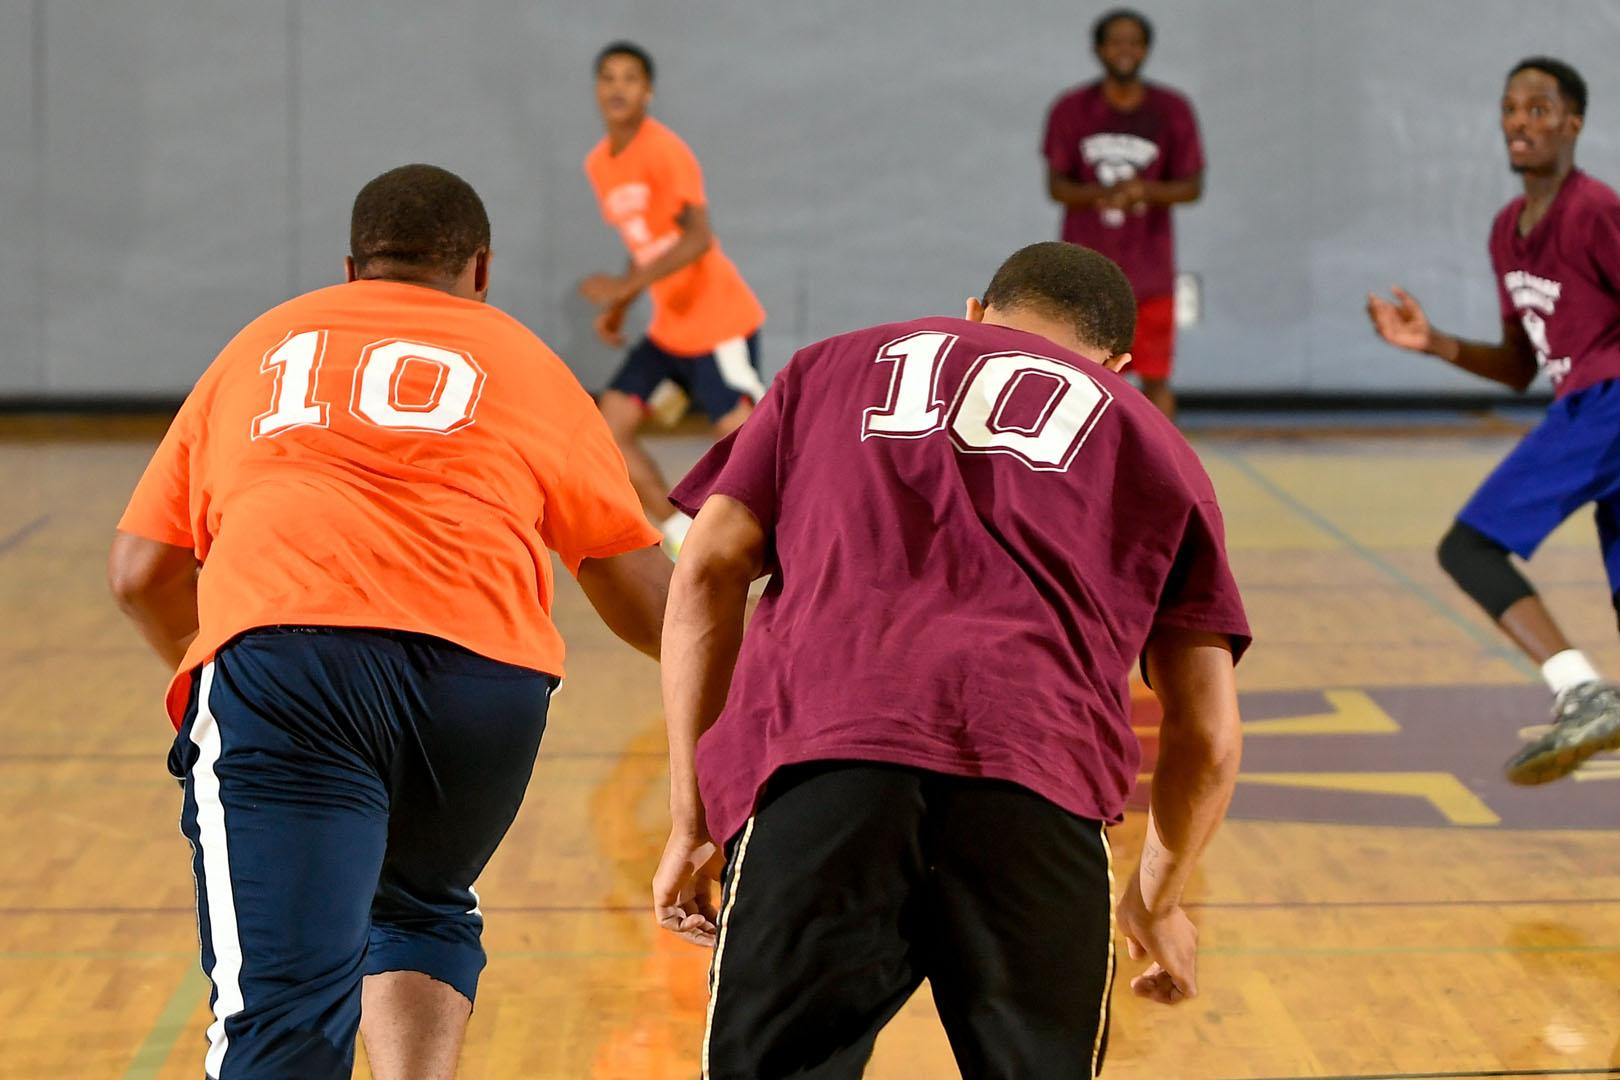 LNBasketball-30309.jpg